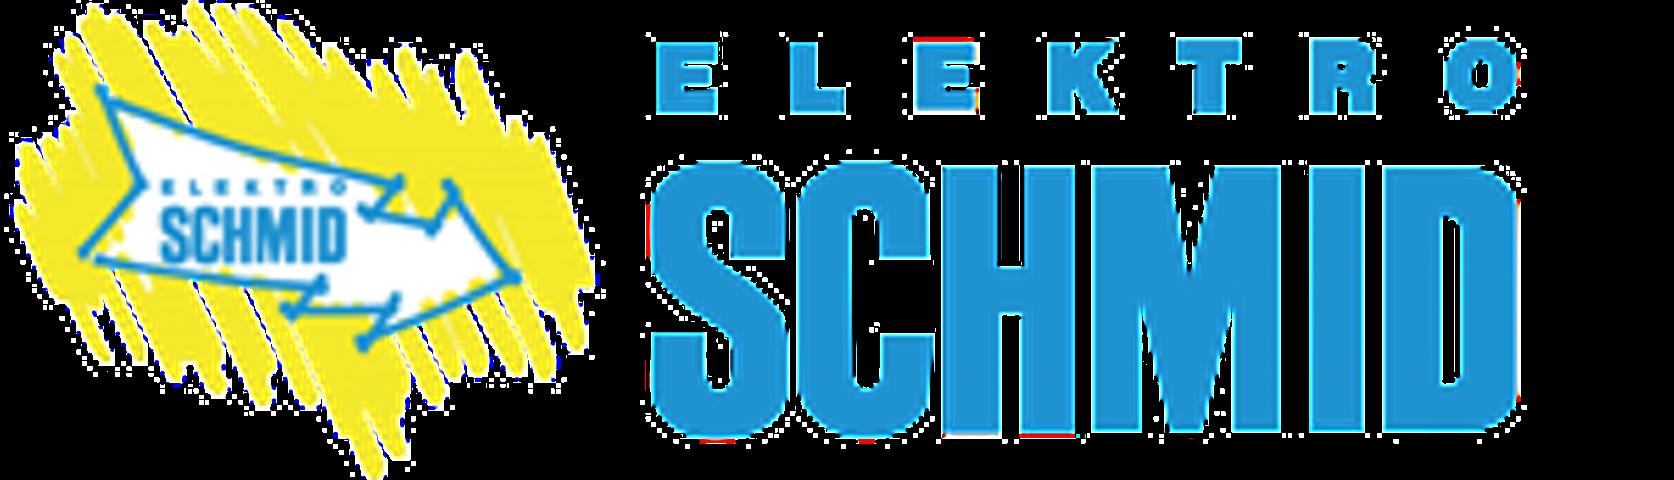 Schmid AG Elektrotechnische Unternehmungen